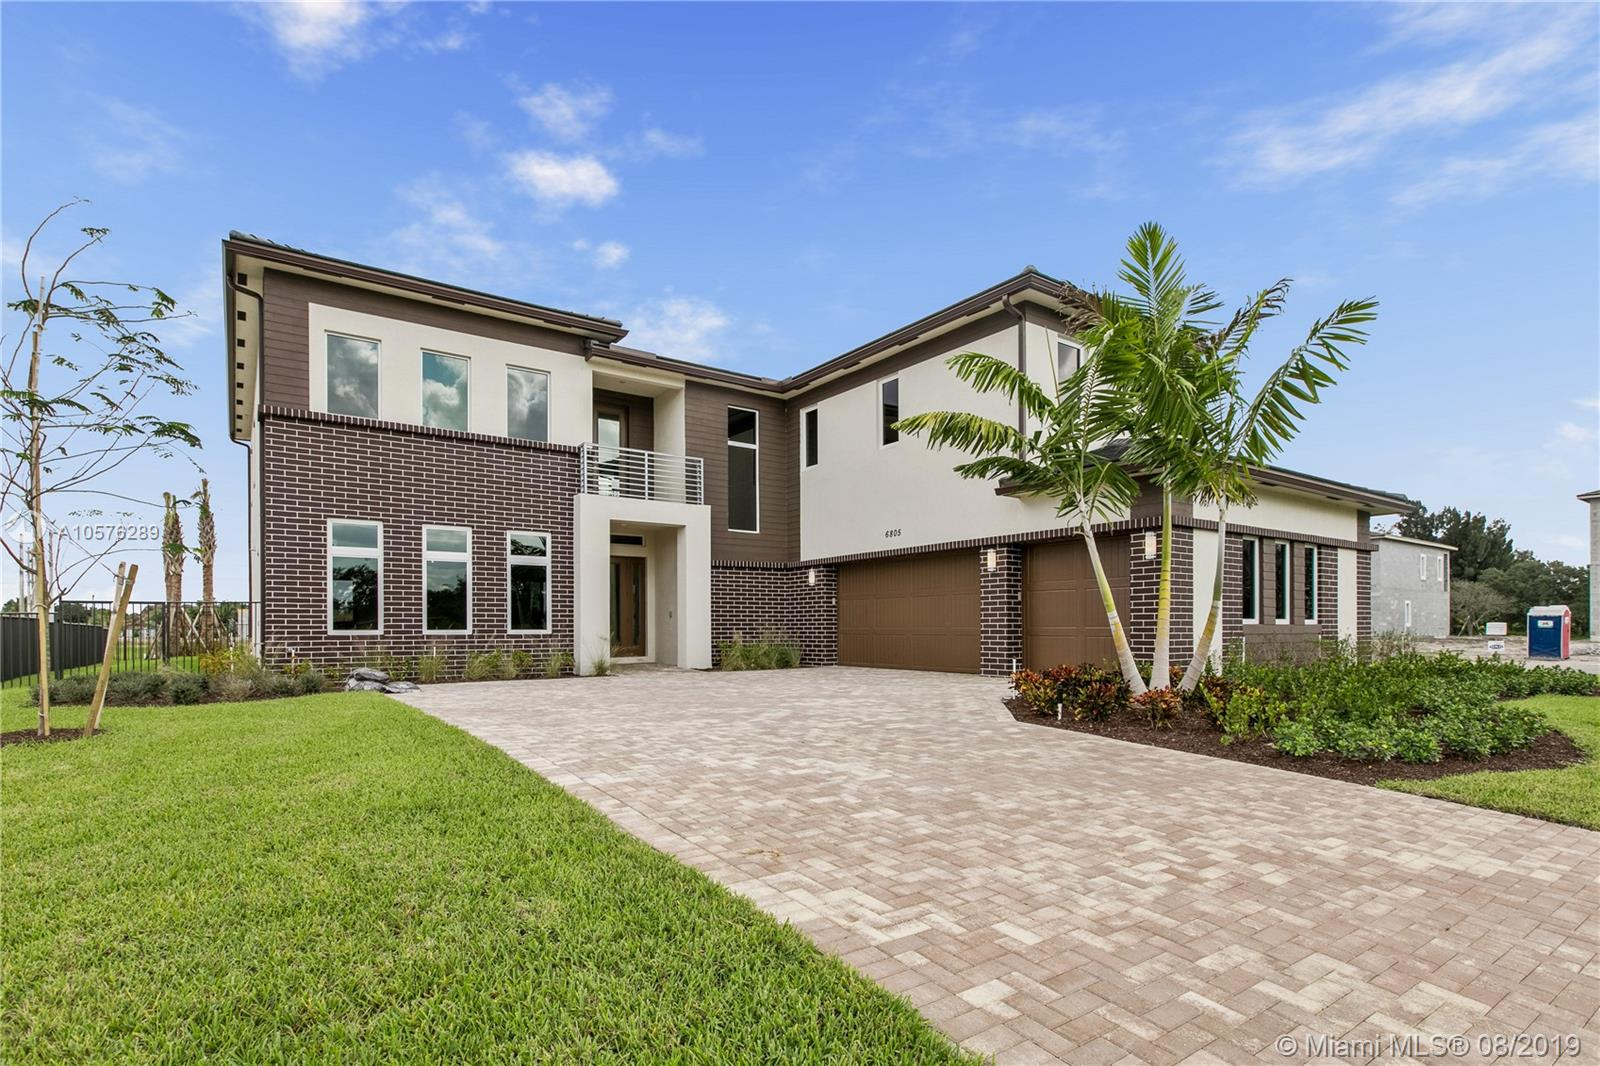 6805 S Stillwater Shores Dr  For Sale A10576289, FL